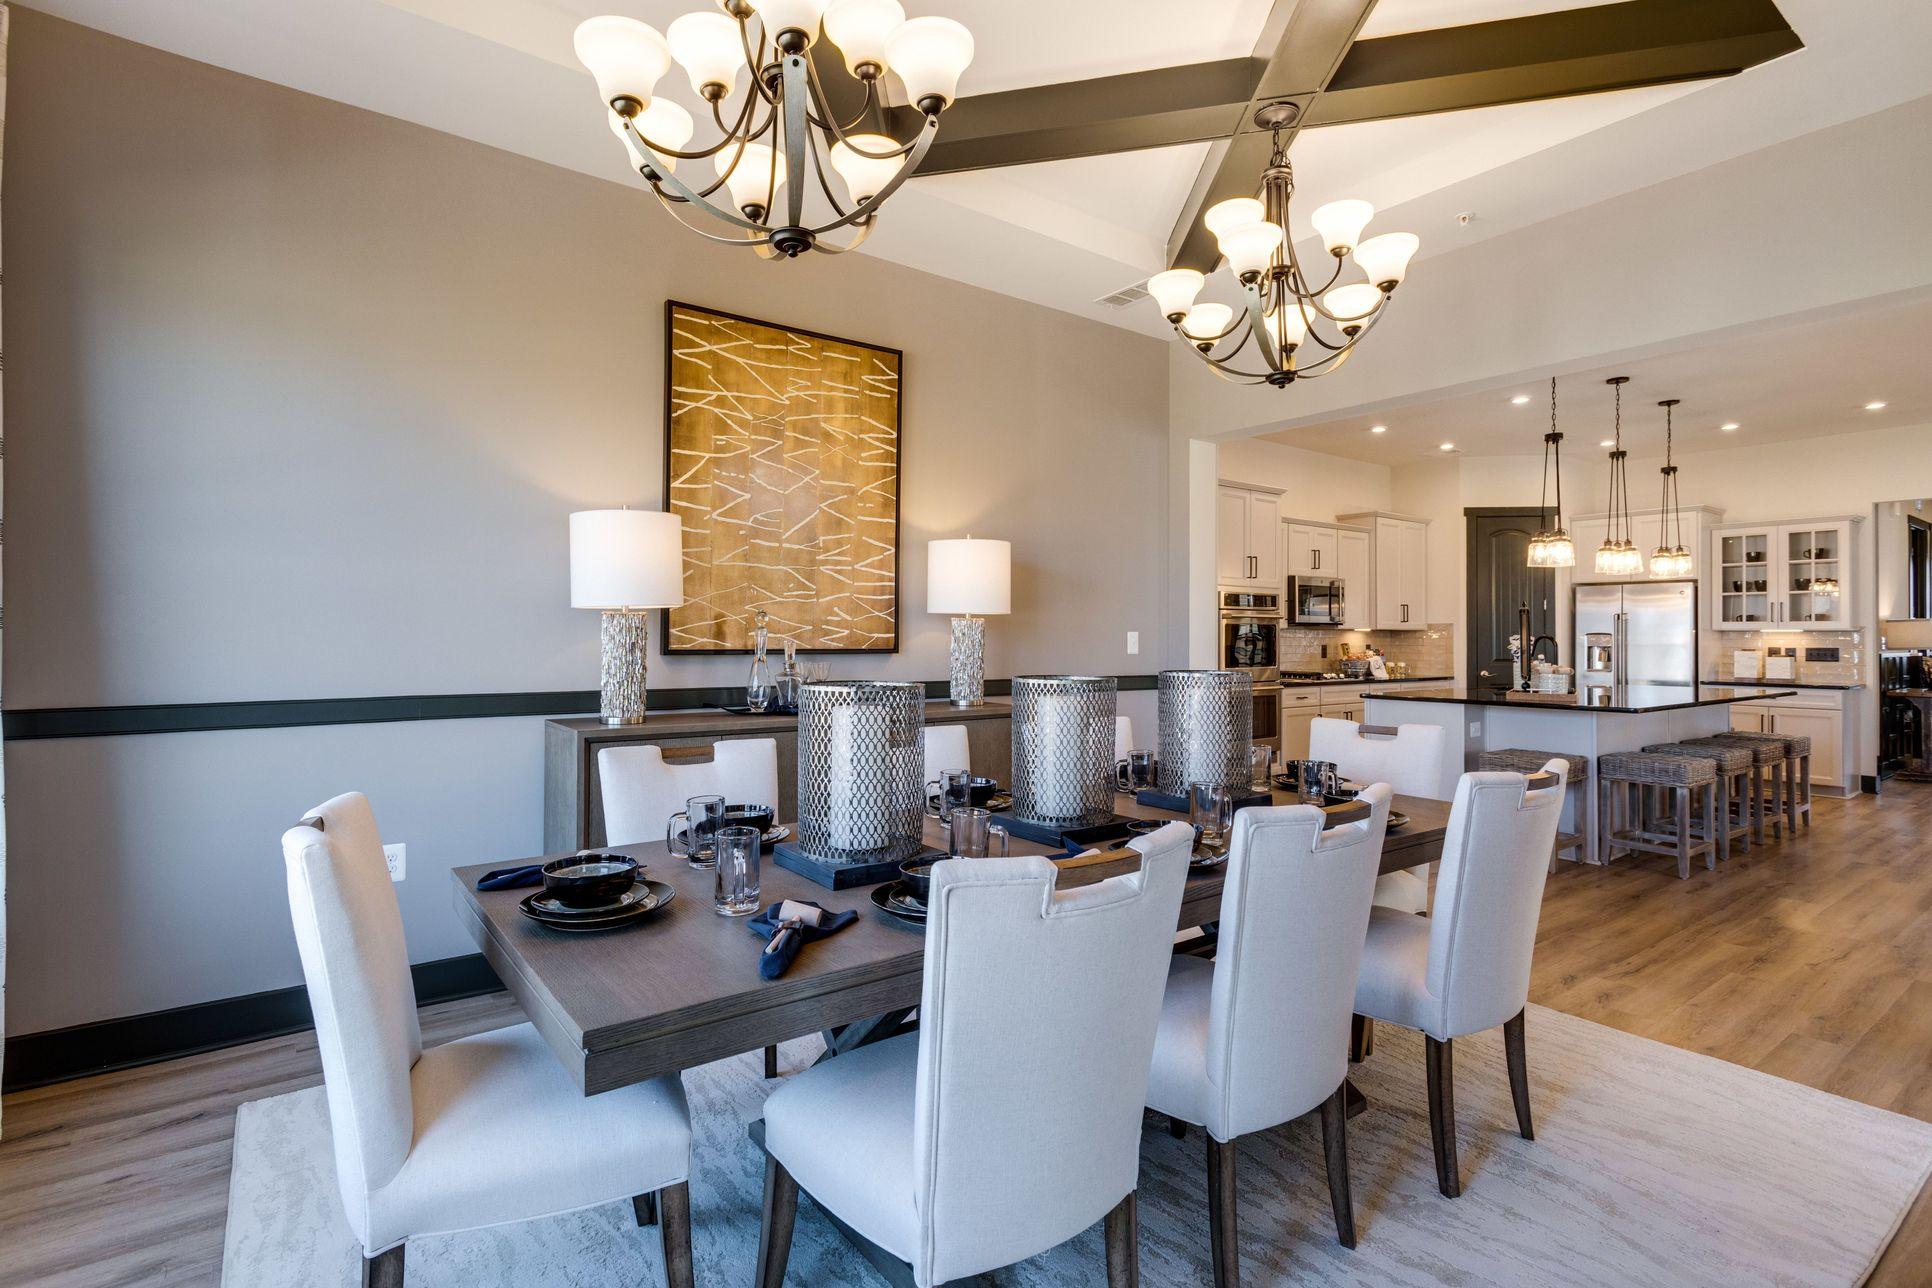 Interior:Dining room off kitchen